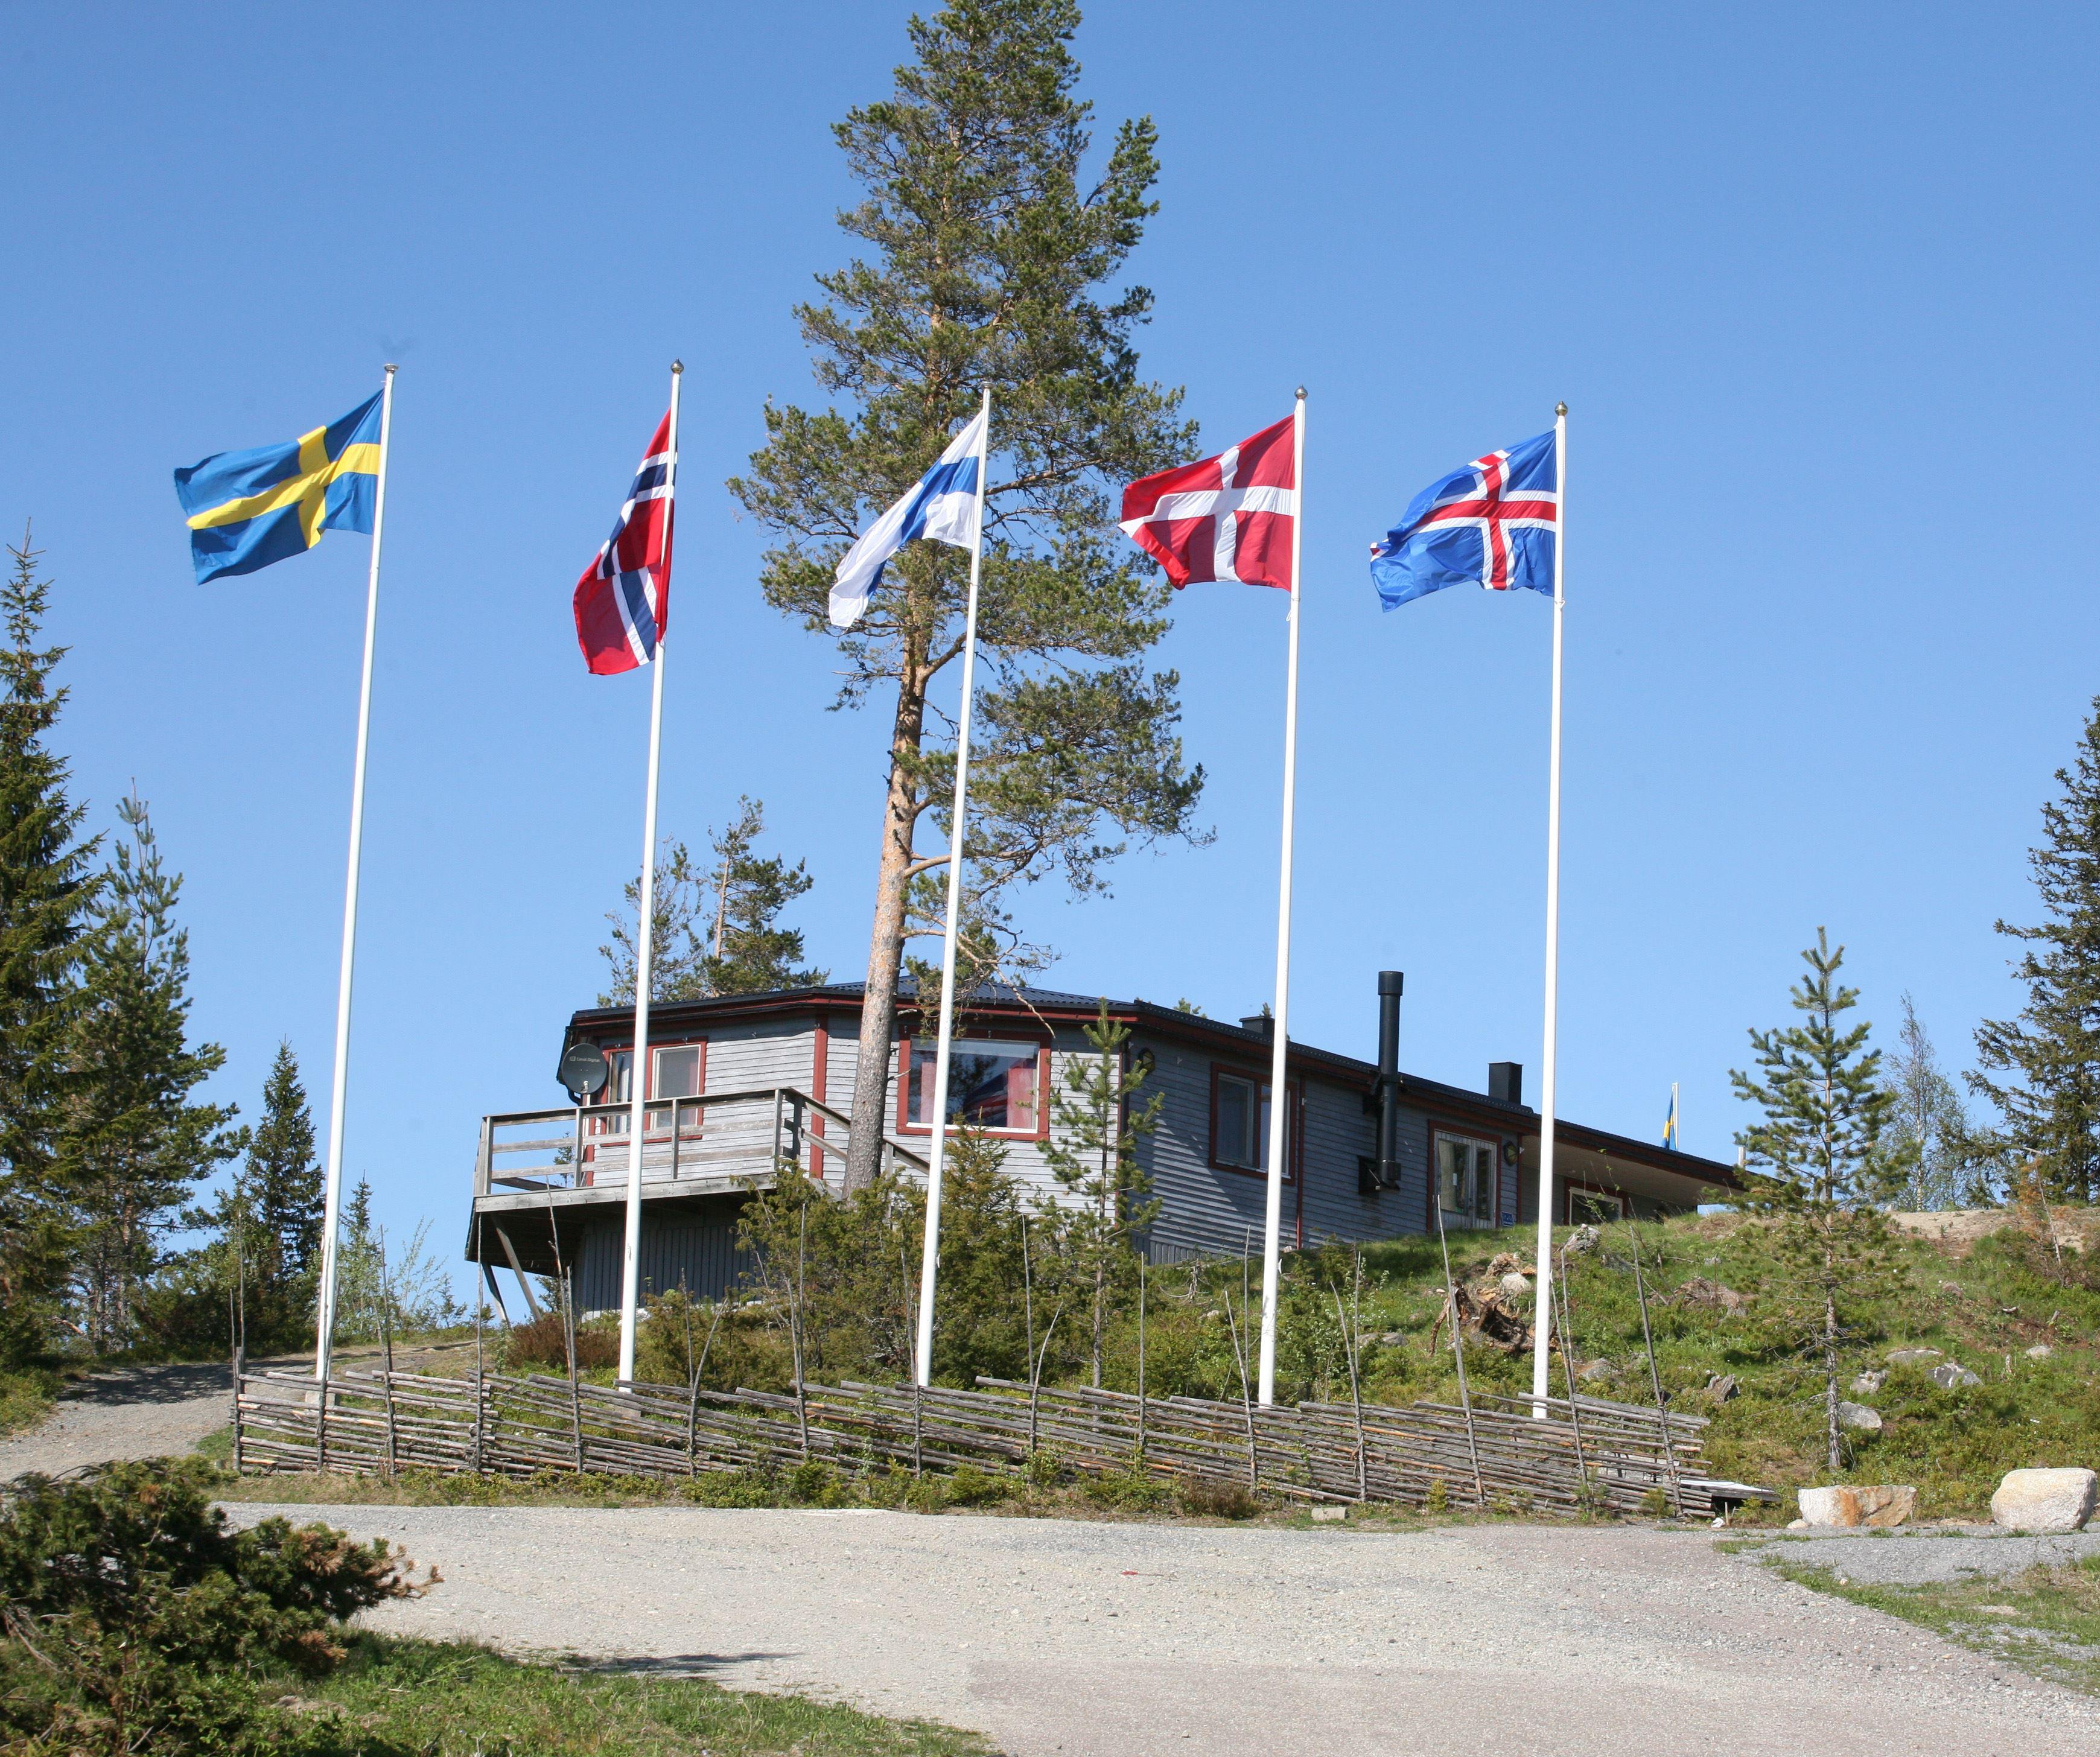 Café - Sveriges geografiska mittpunkt